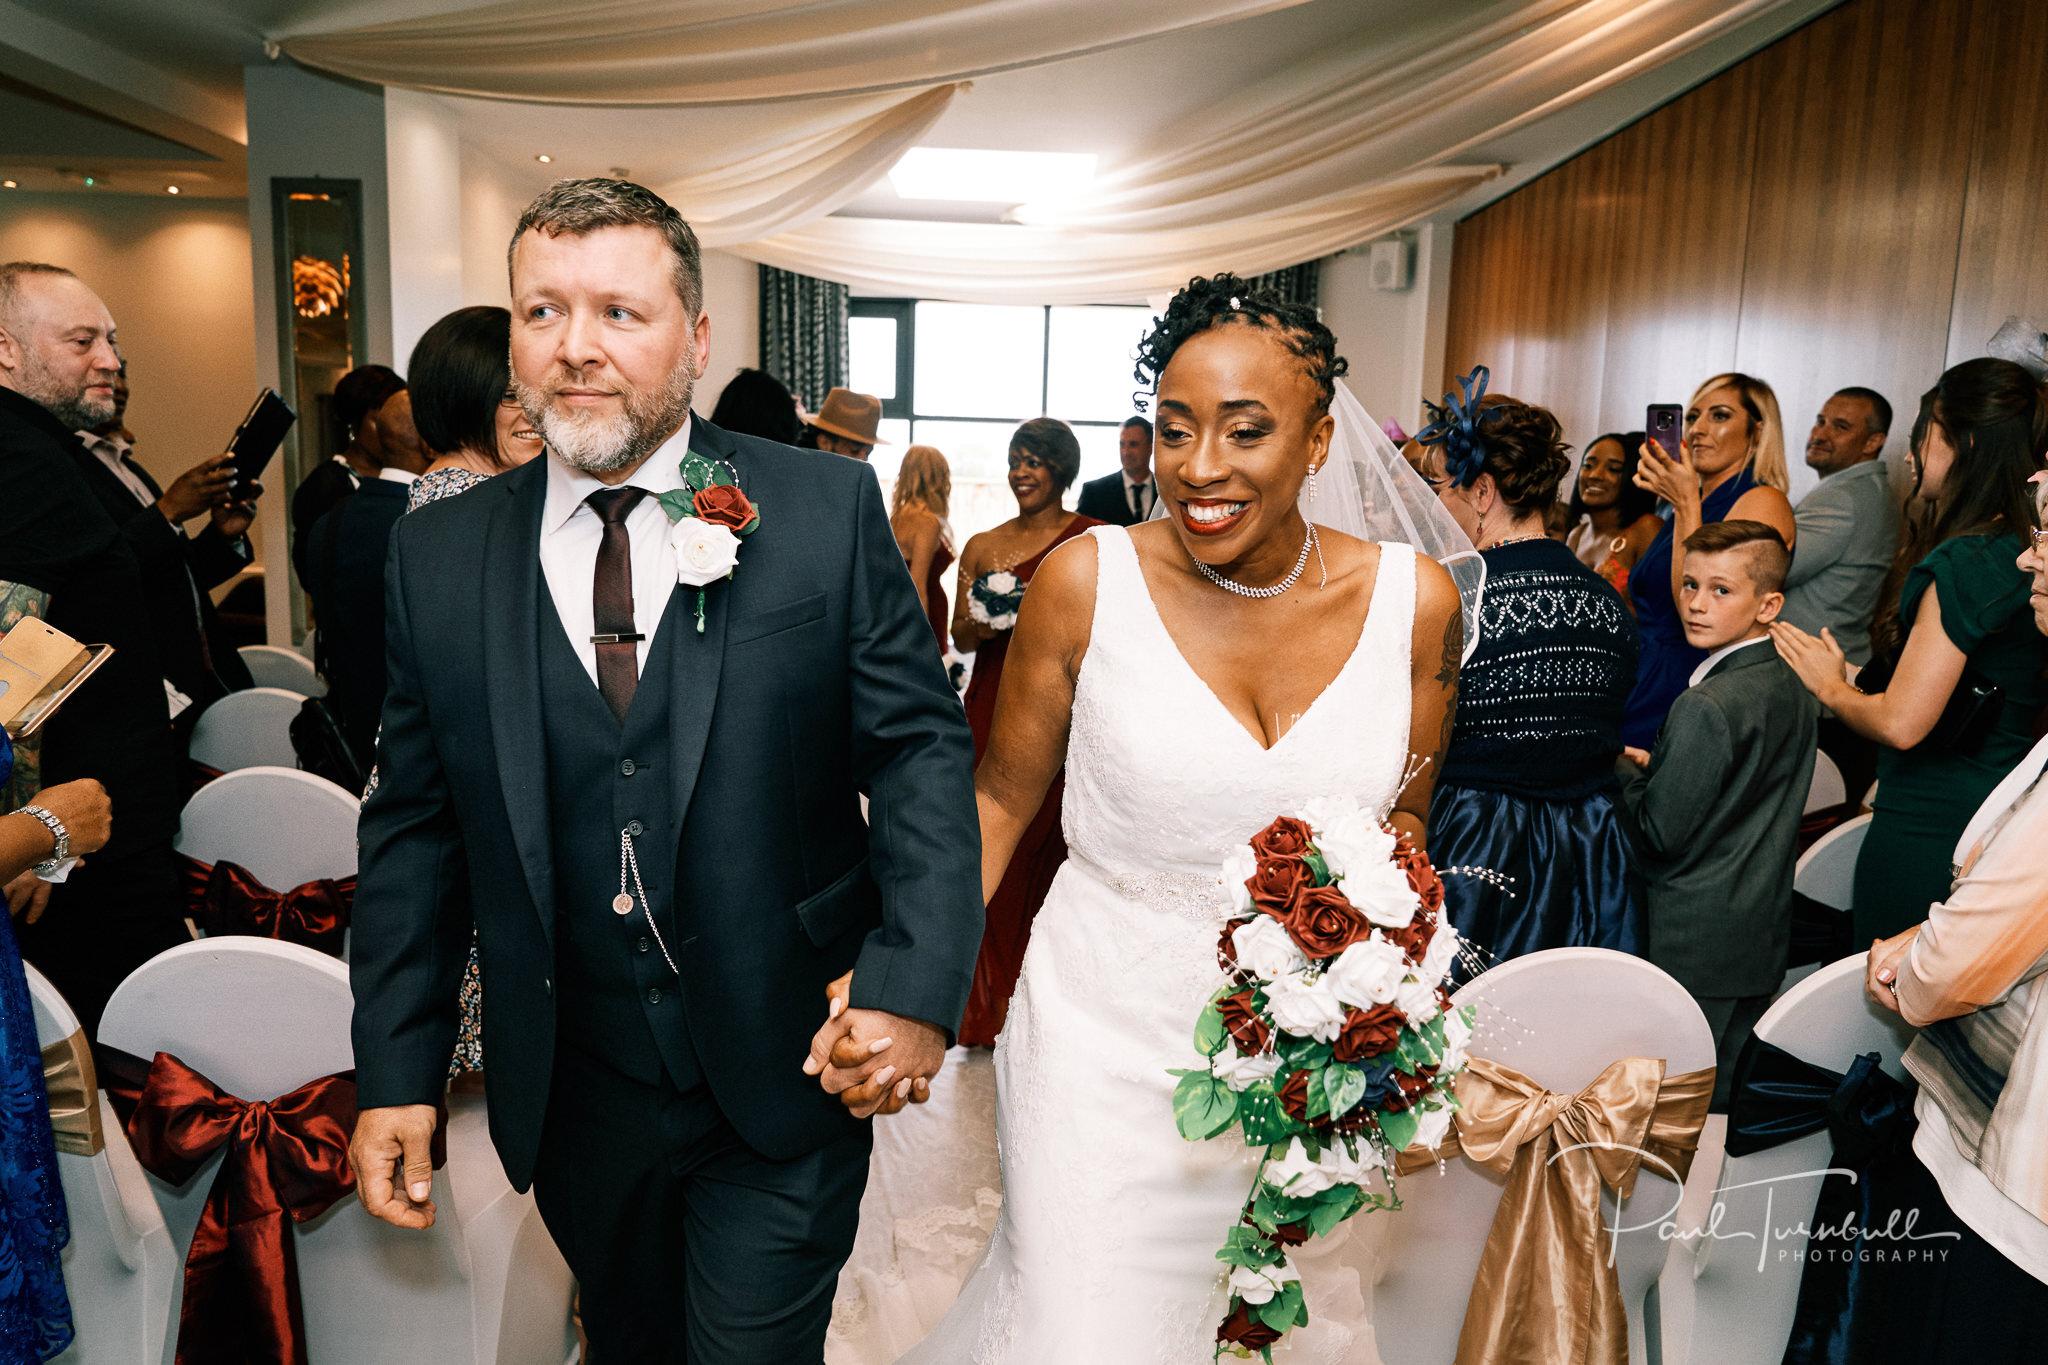 wedding-photographer-hull-yorkshire-lazaat-hotel-carlene-steve-16.jpg